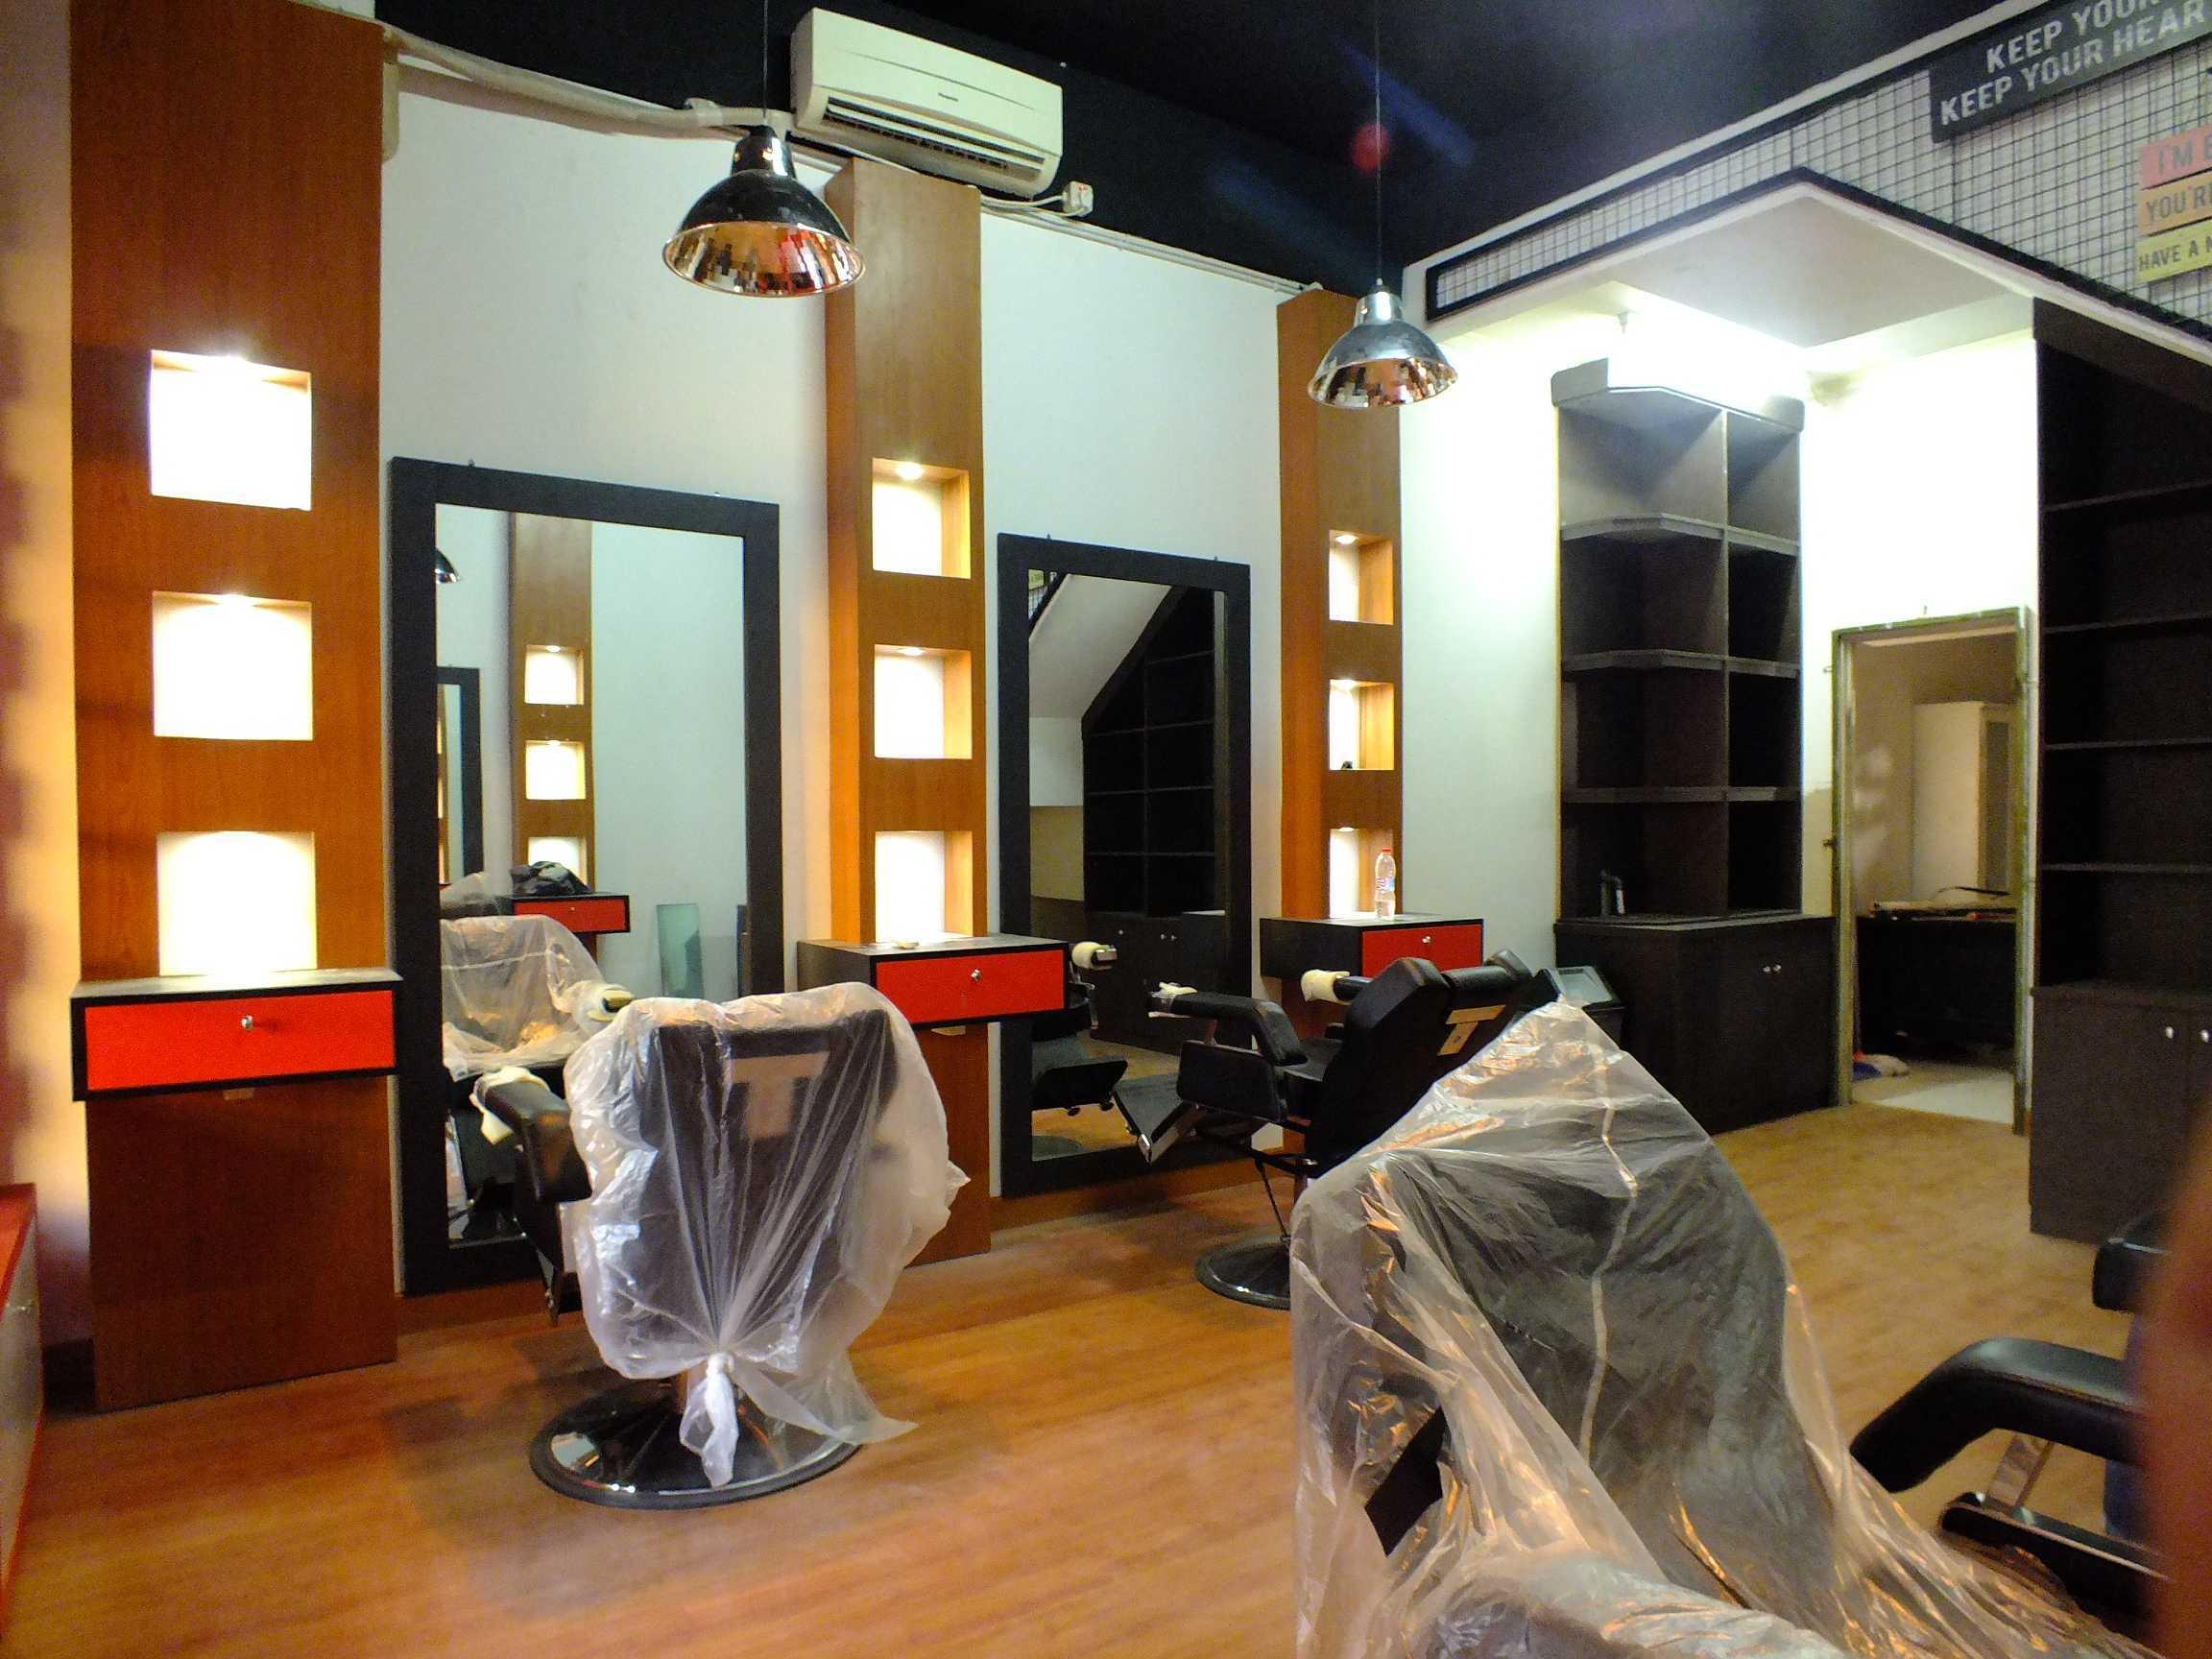 Canvas Mkc Barberbuzz - Barbershop Tangerang Tangerang Interior   20874